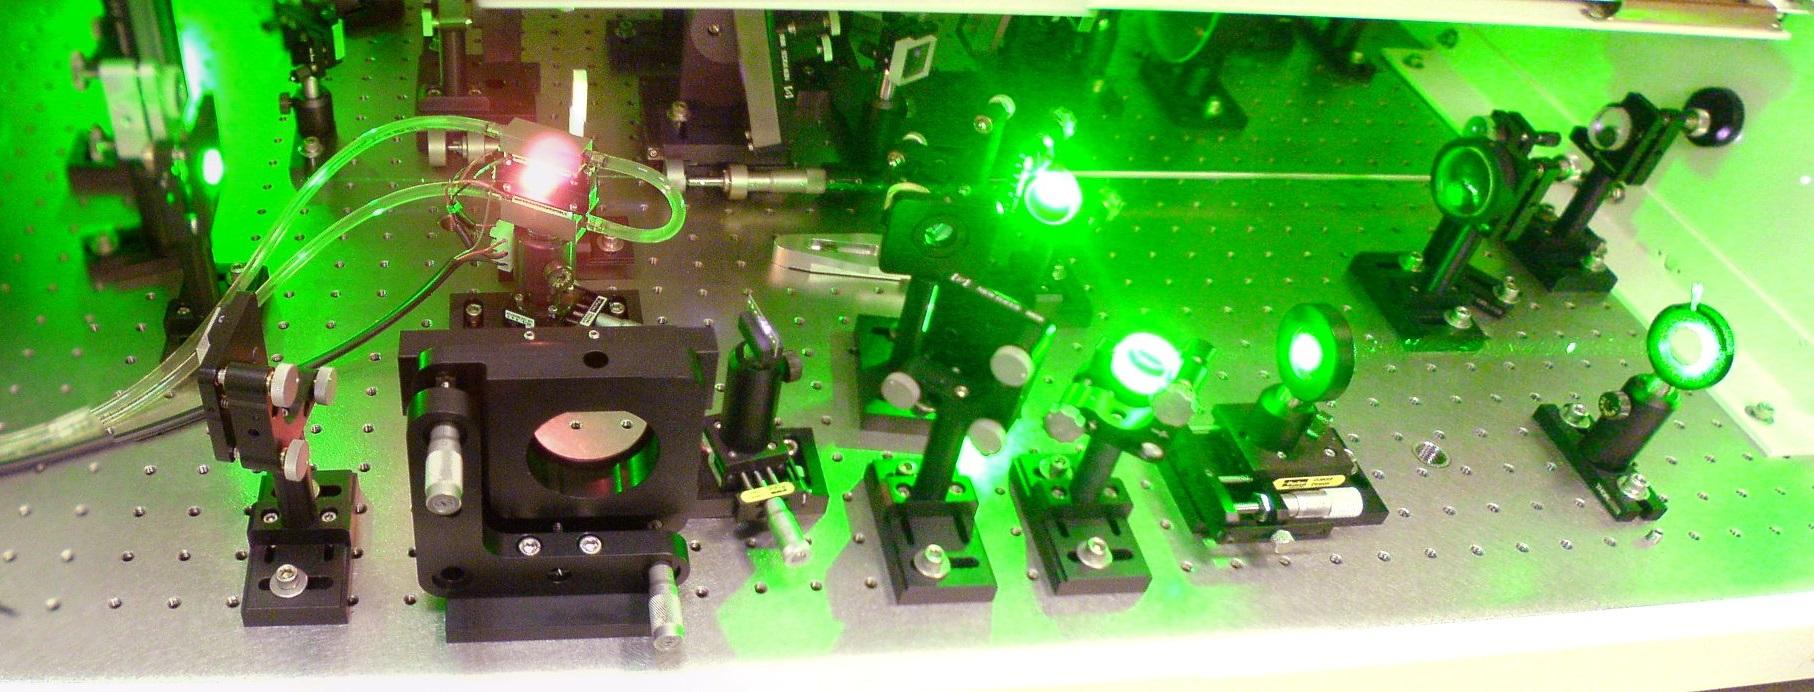 Laser system development